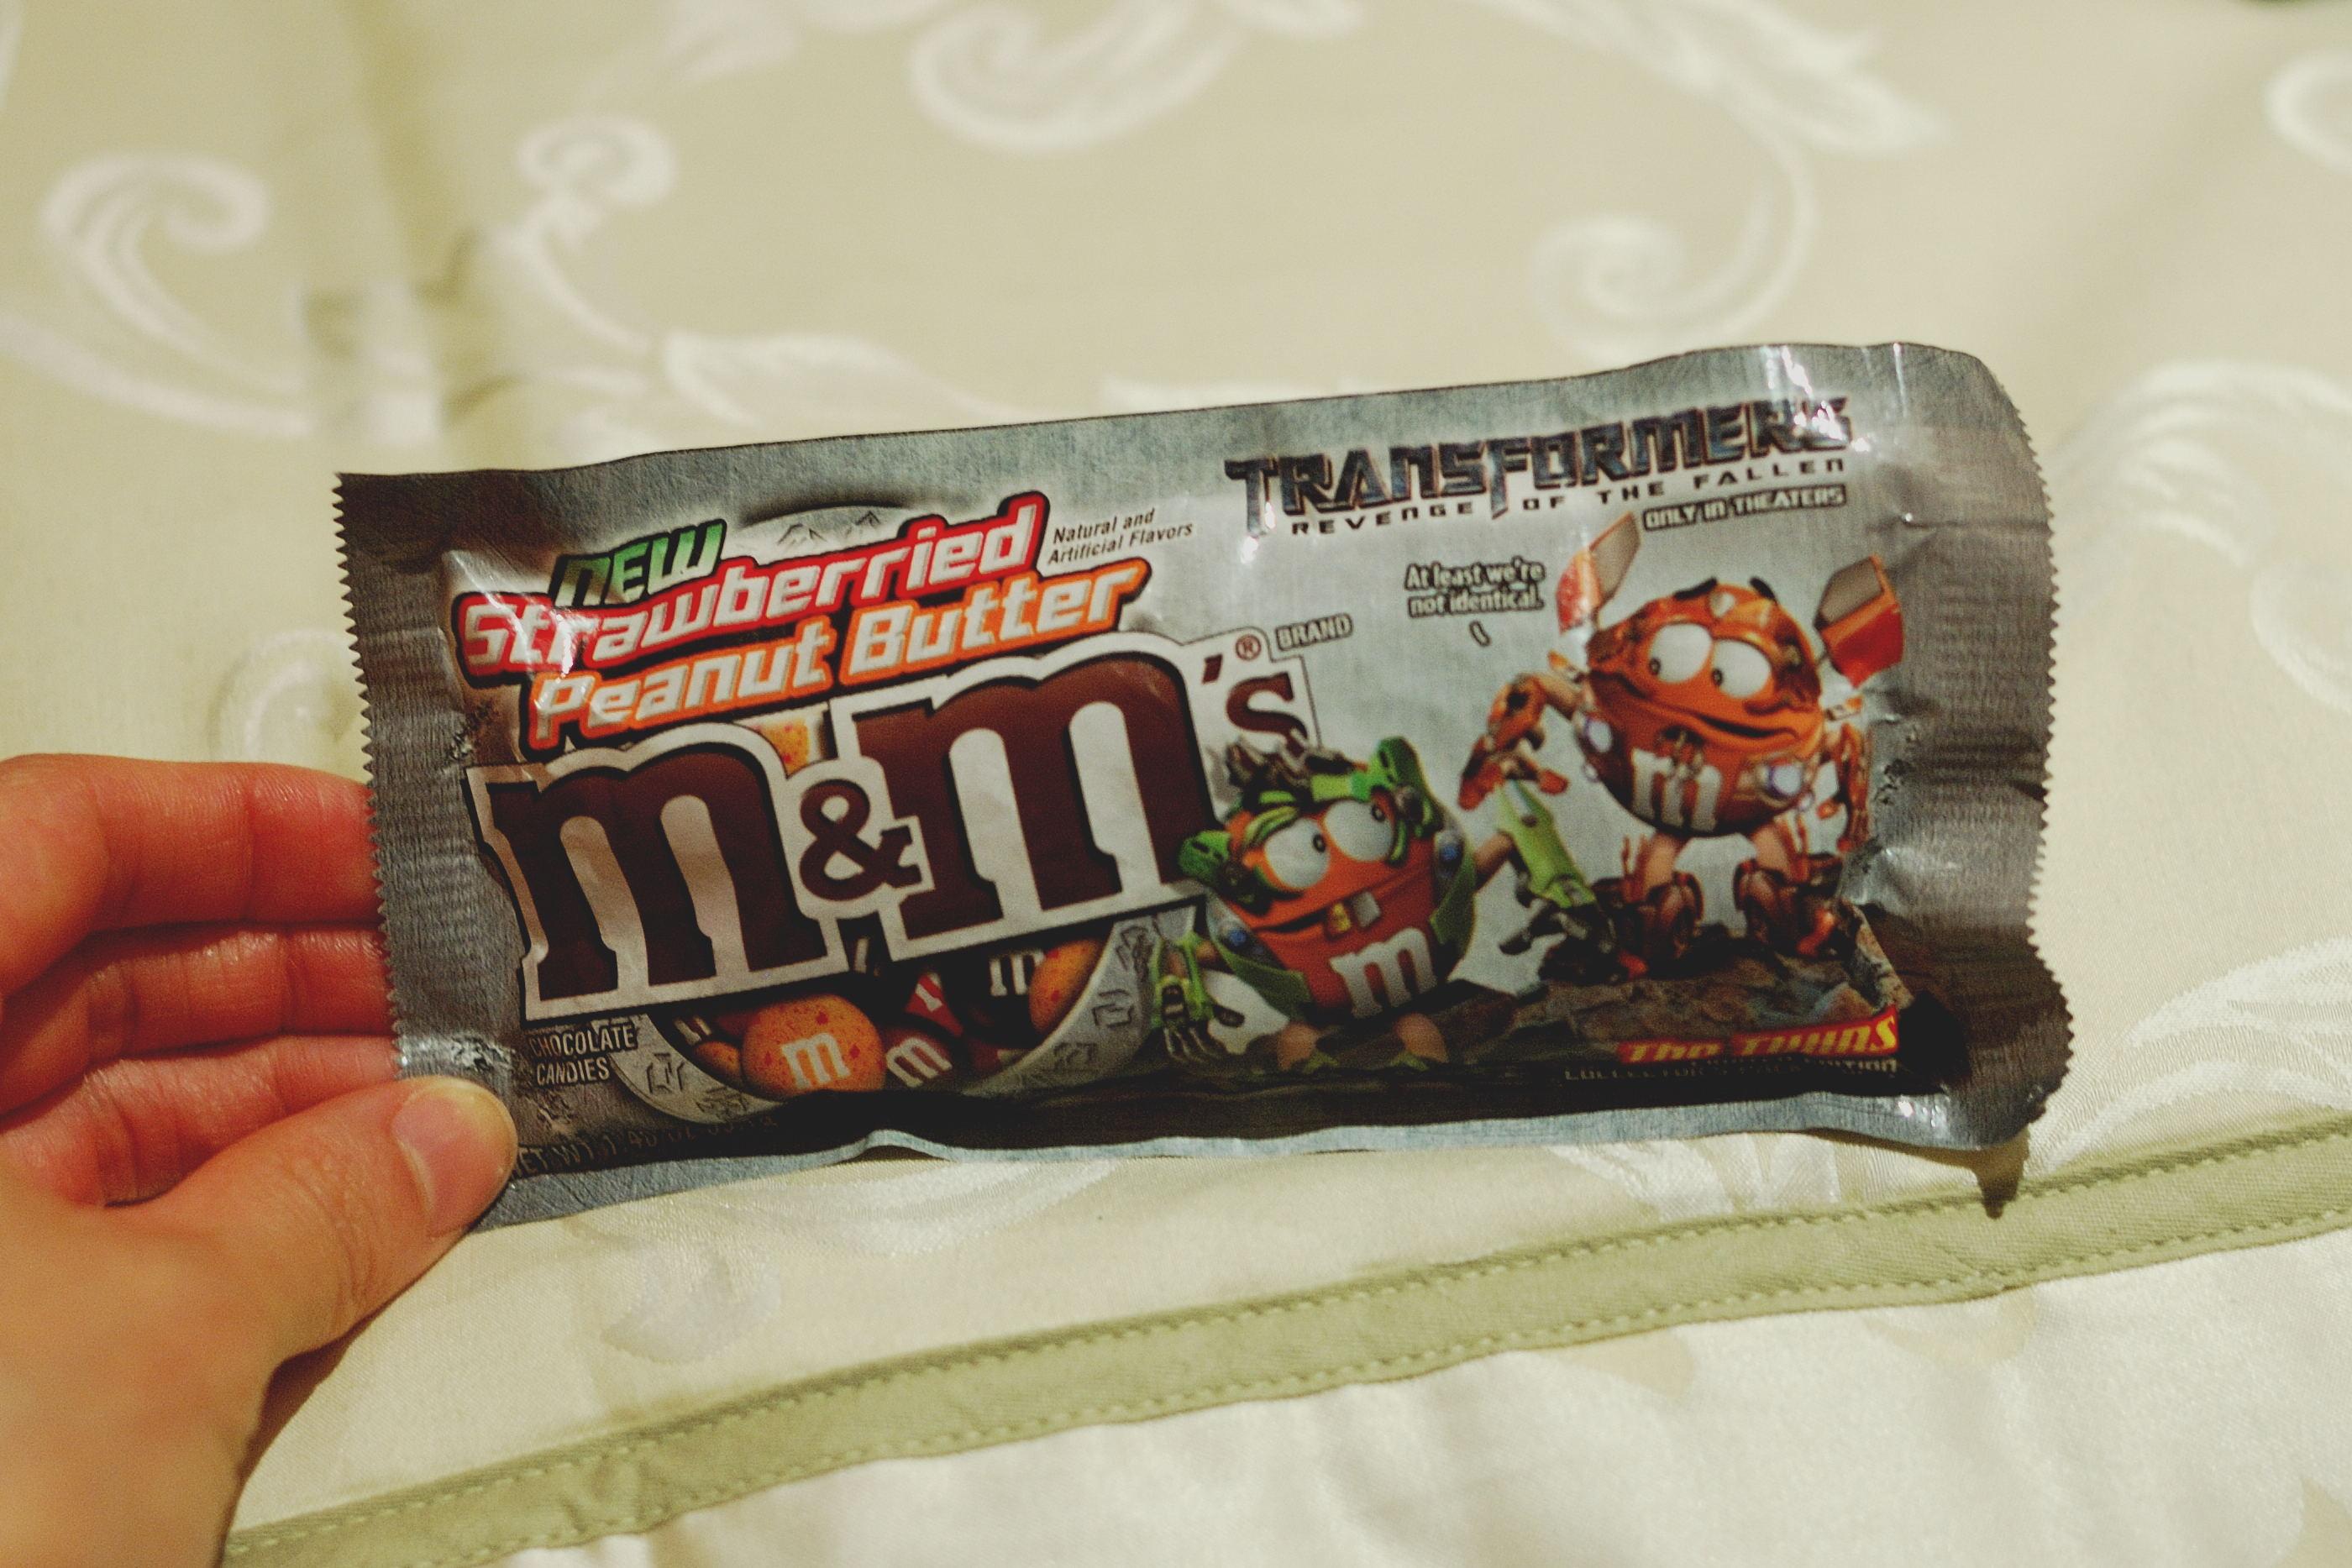 Strawberried Peanut Butter M&Ms